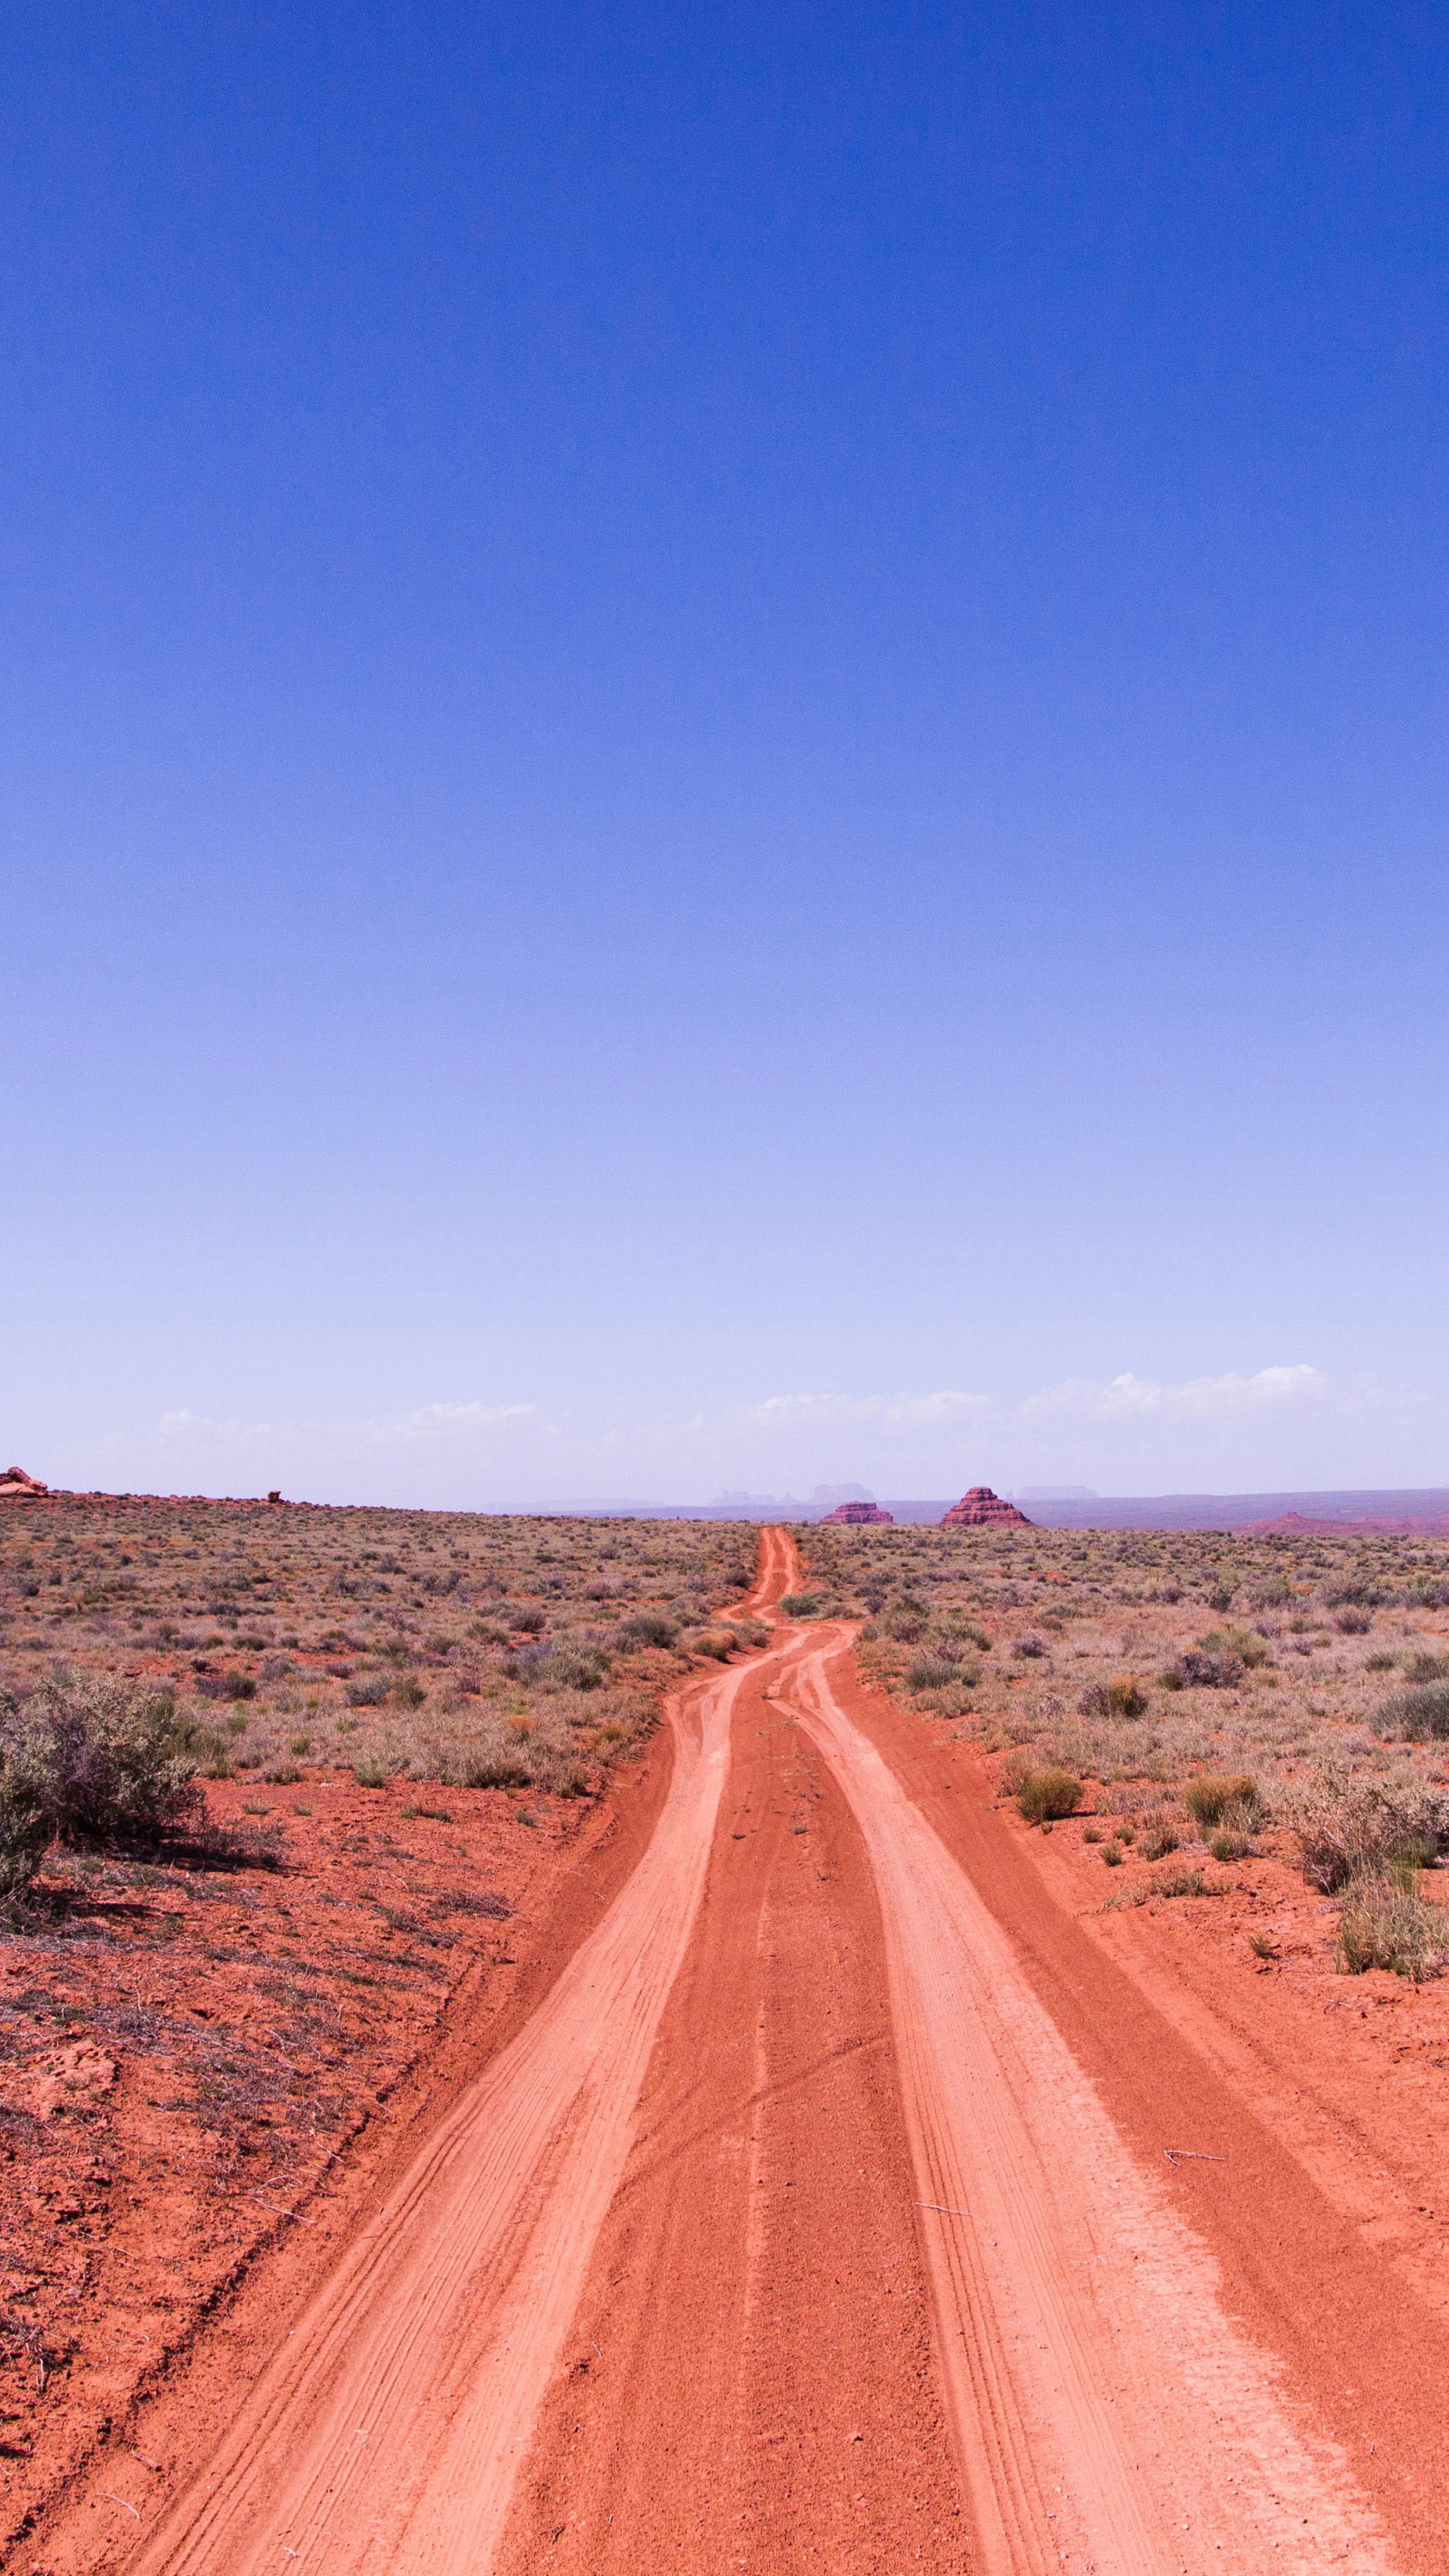 arid-barren-blue-sky-451813.jpg